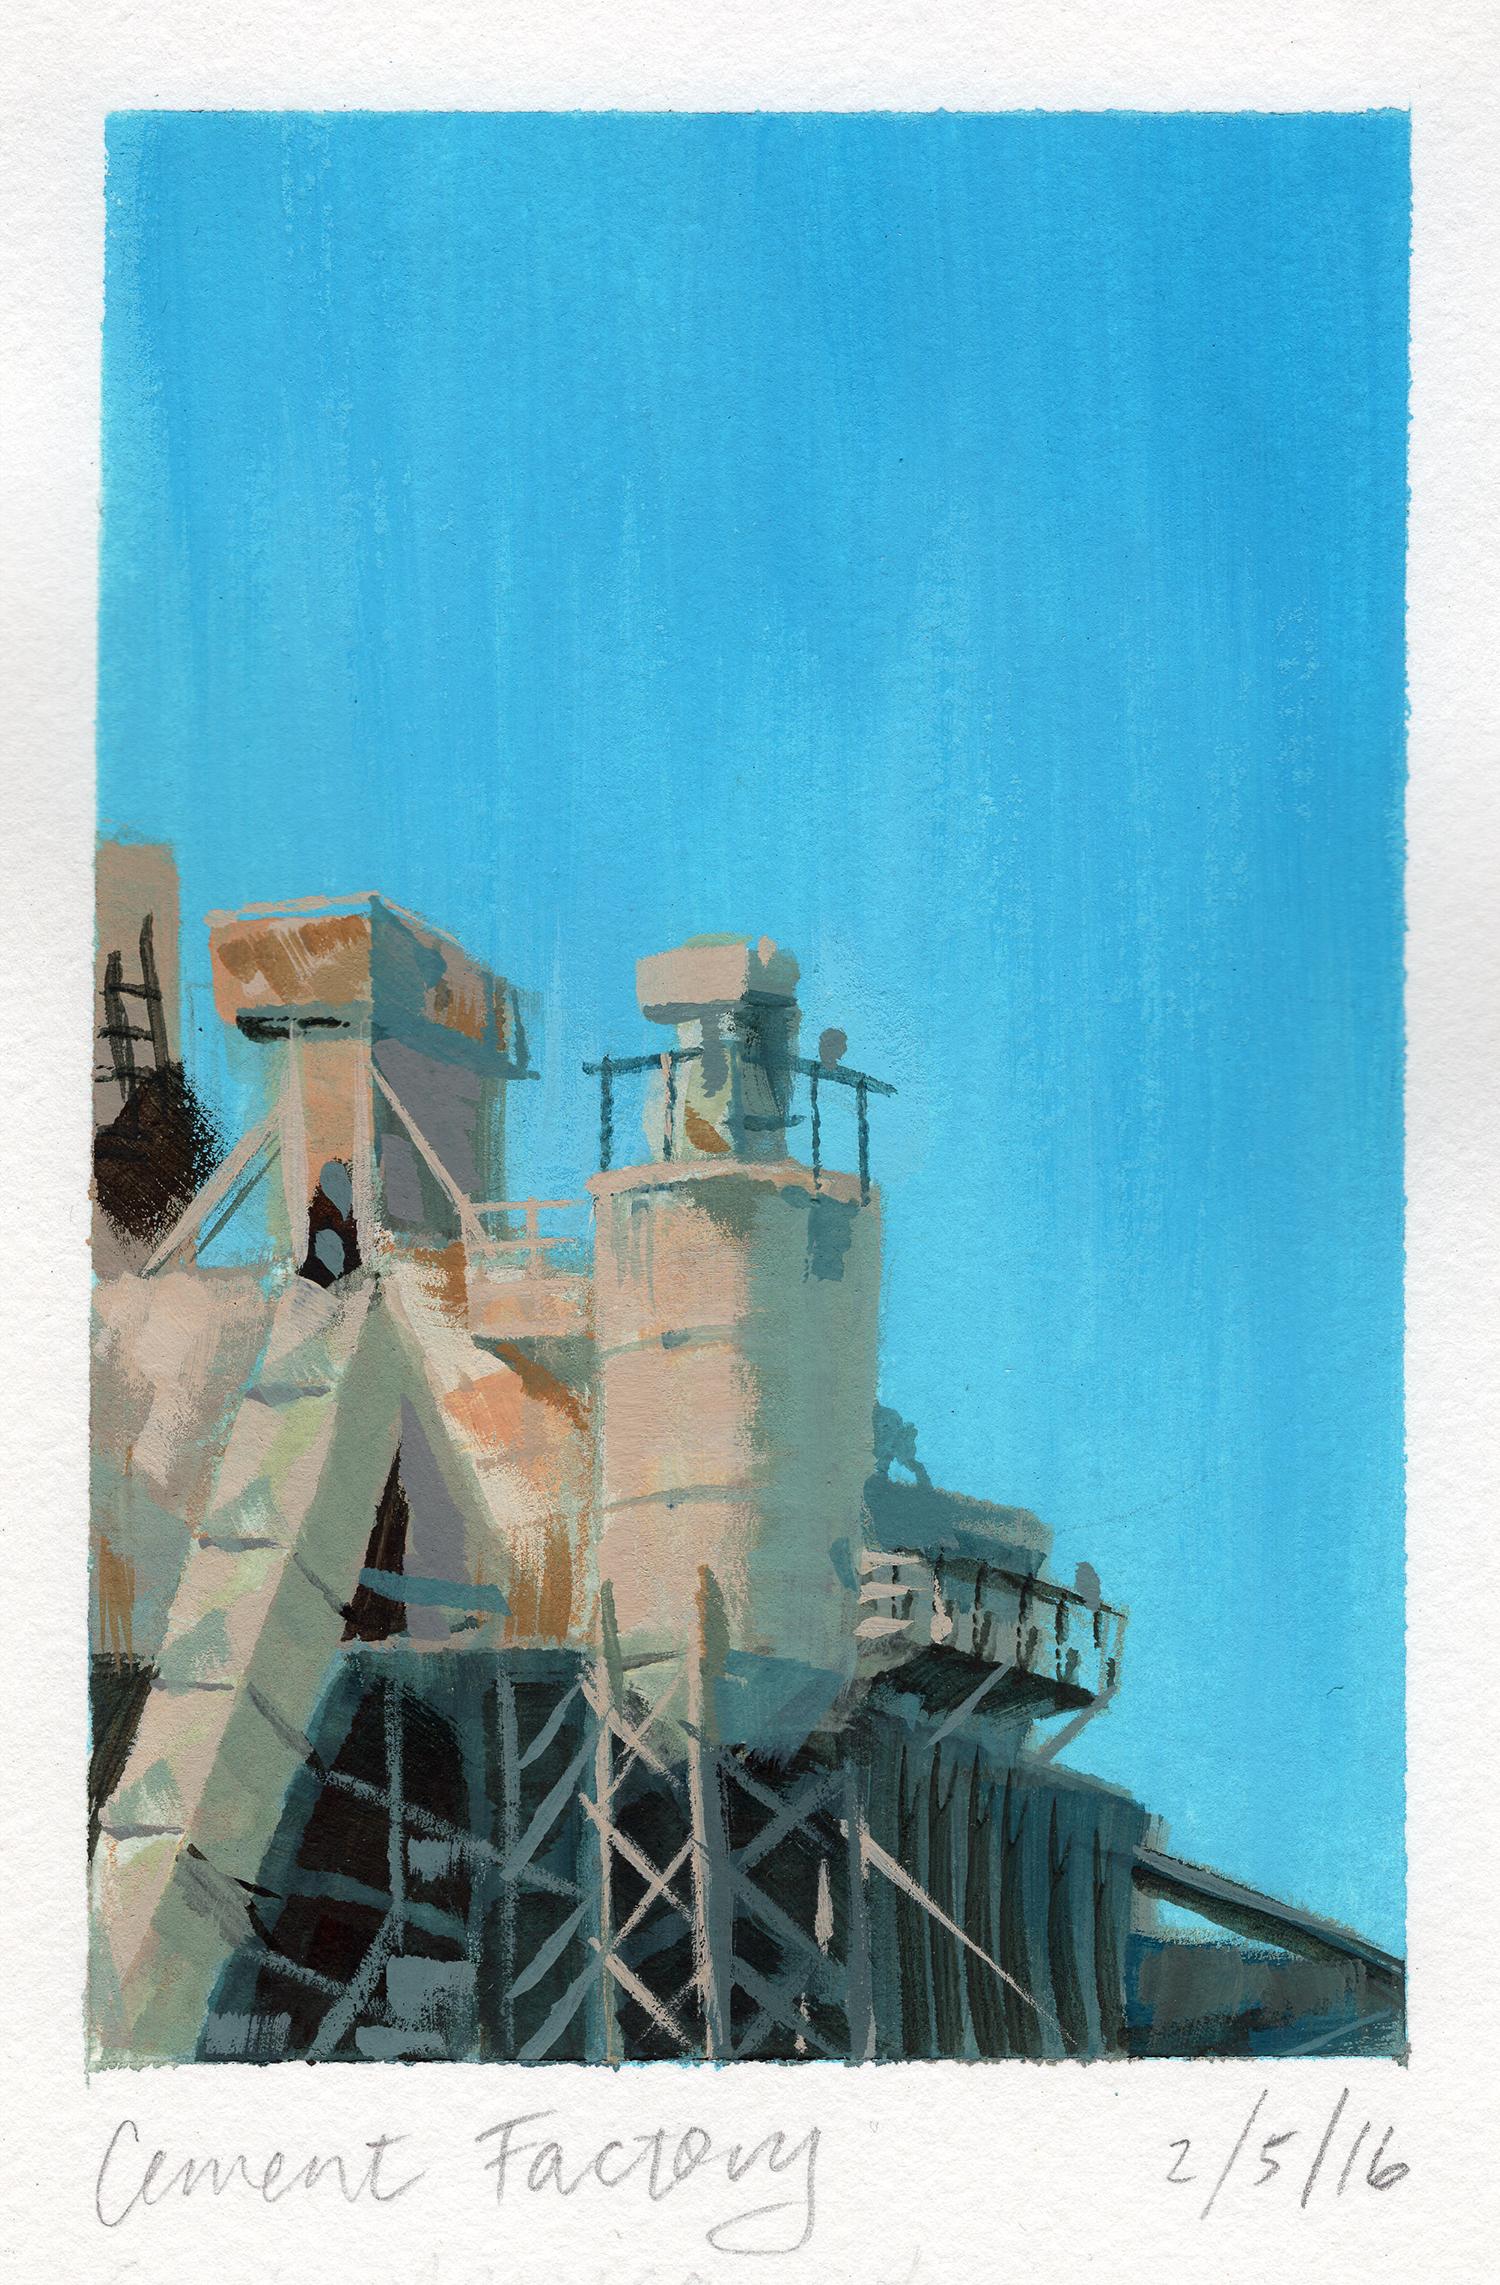 Santa Monica Cement Factory_4x6.jpg